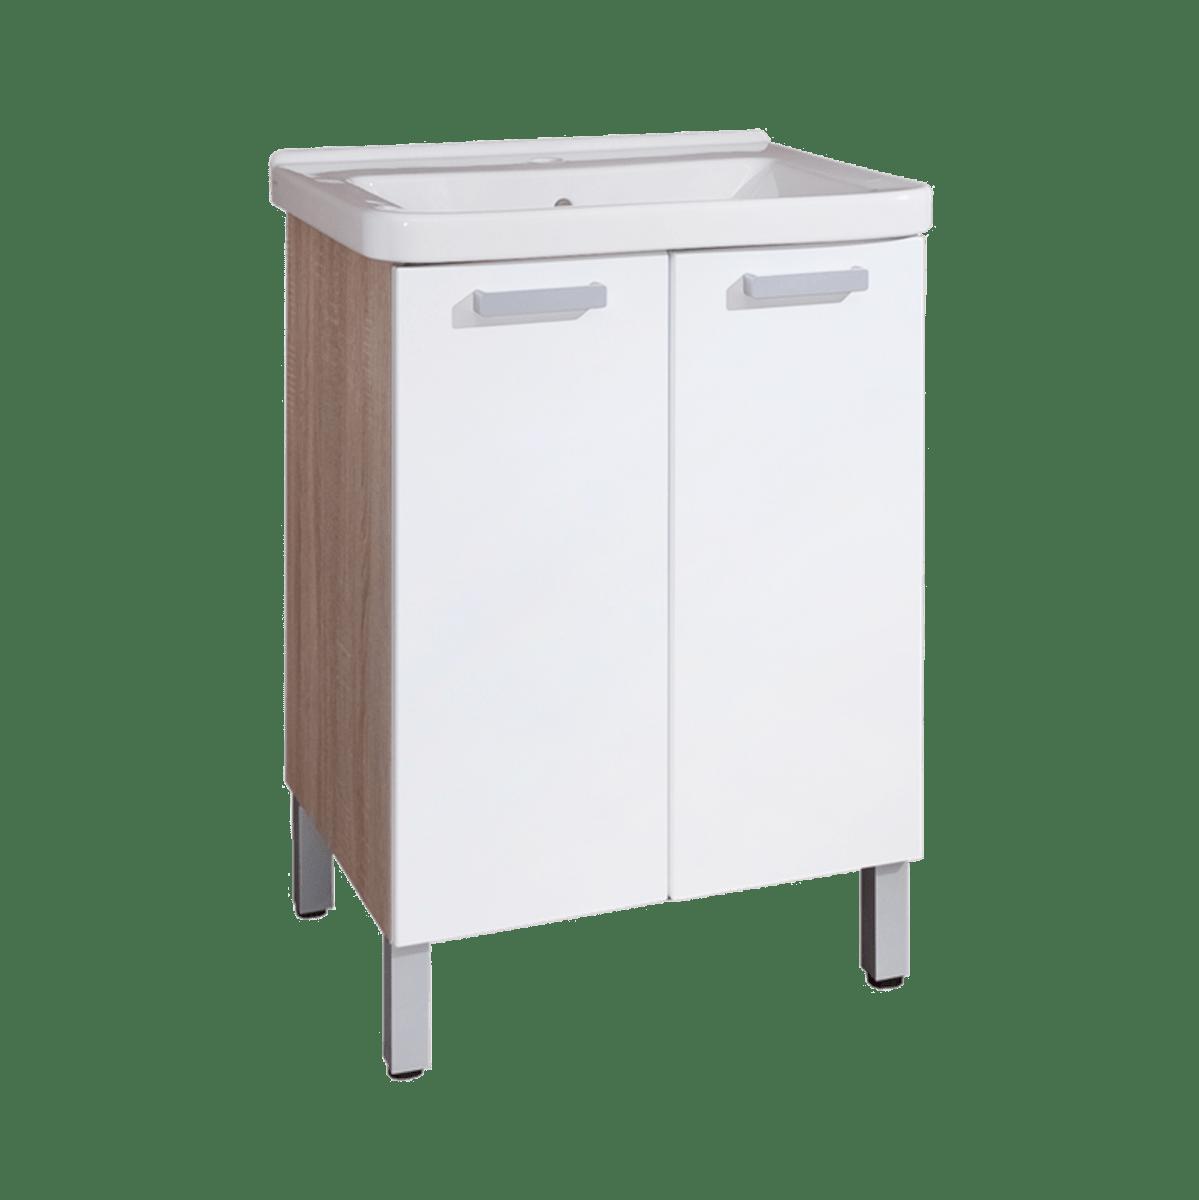 Kúpeľňová skrinka s umývadlom Naturel Vario 65x48,5 cm biela VARIO65DBBL